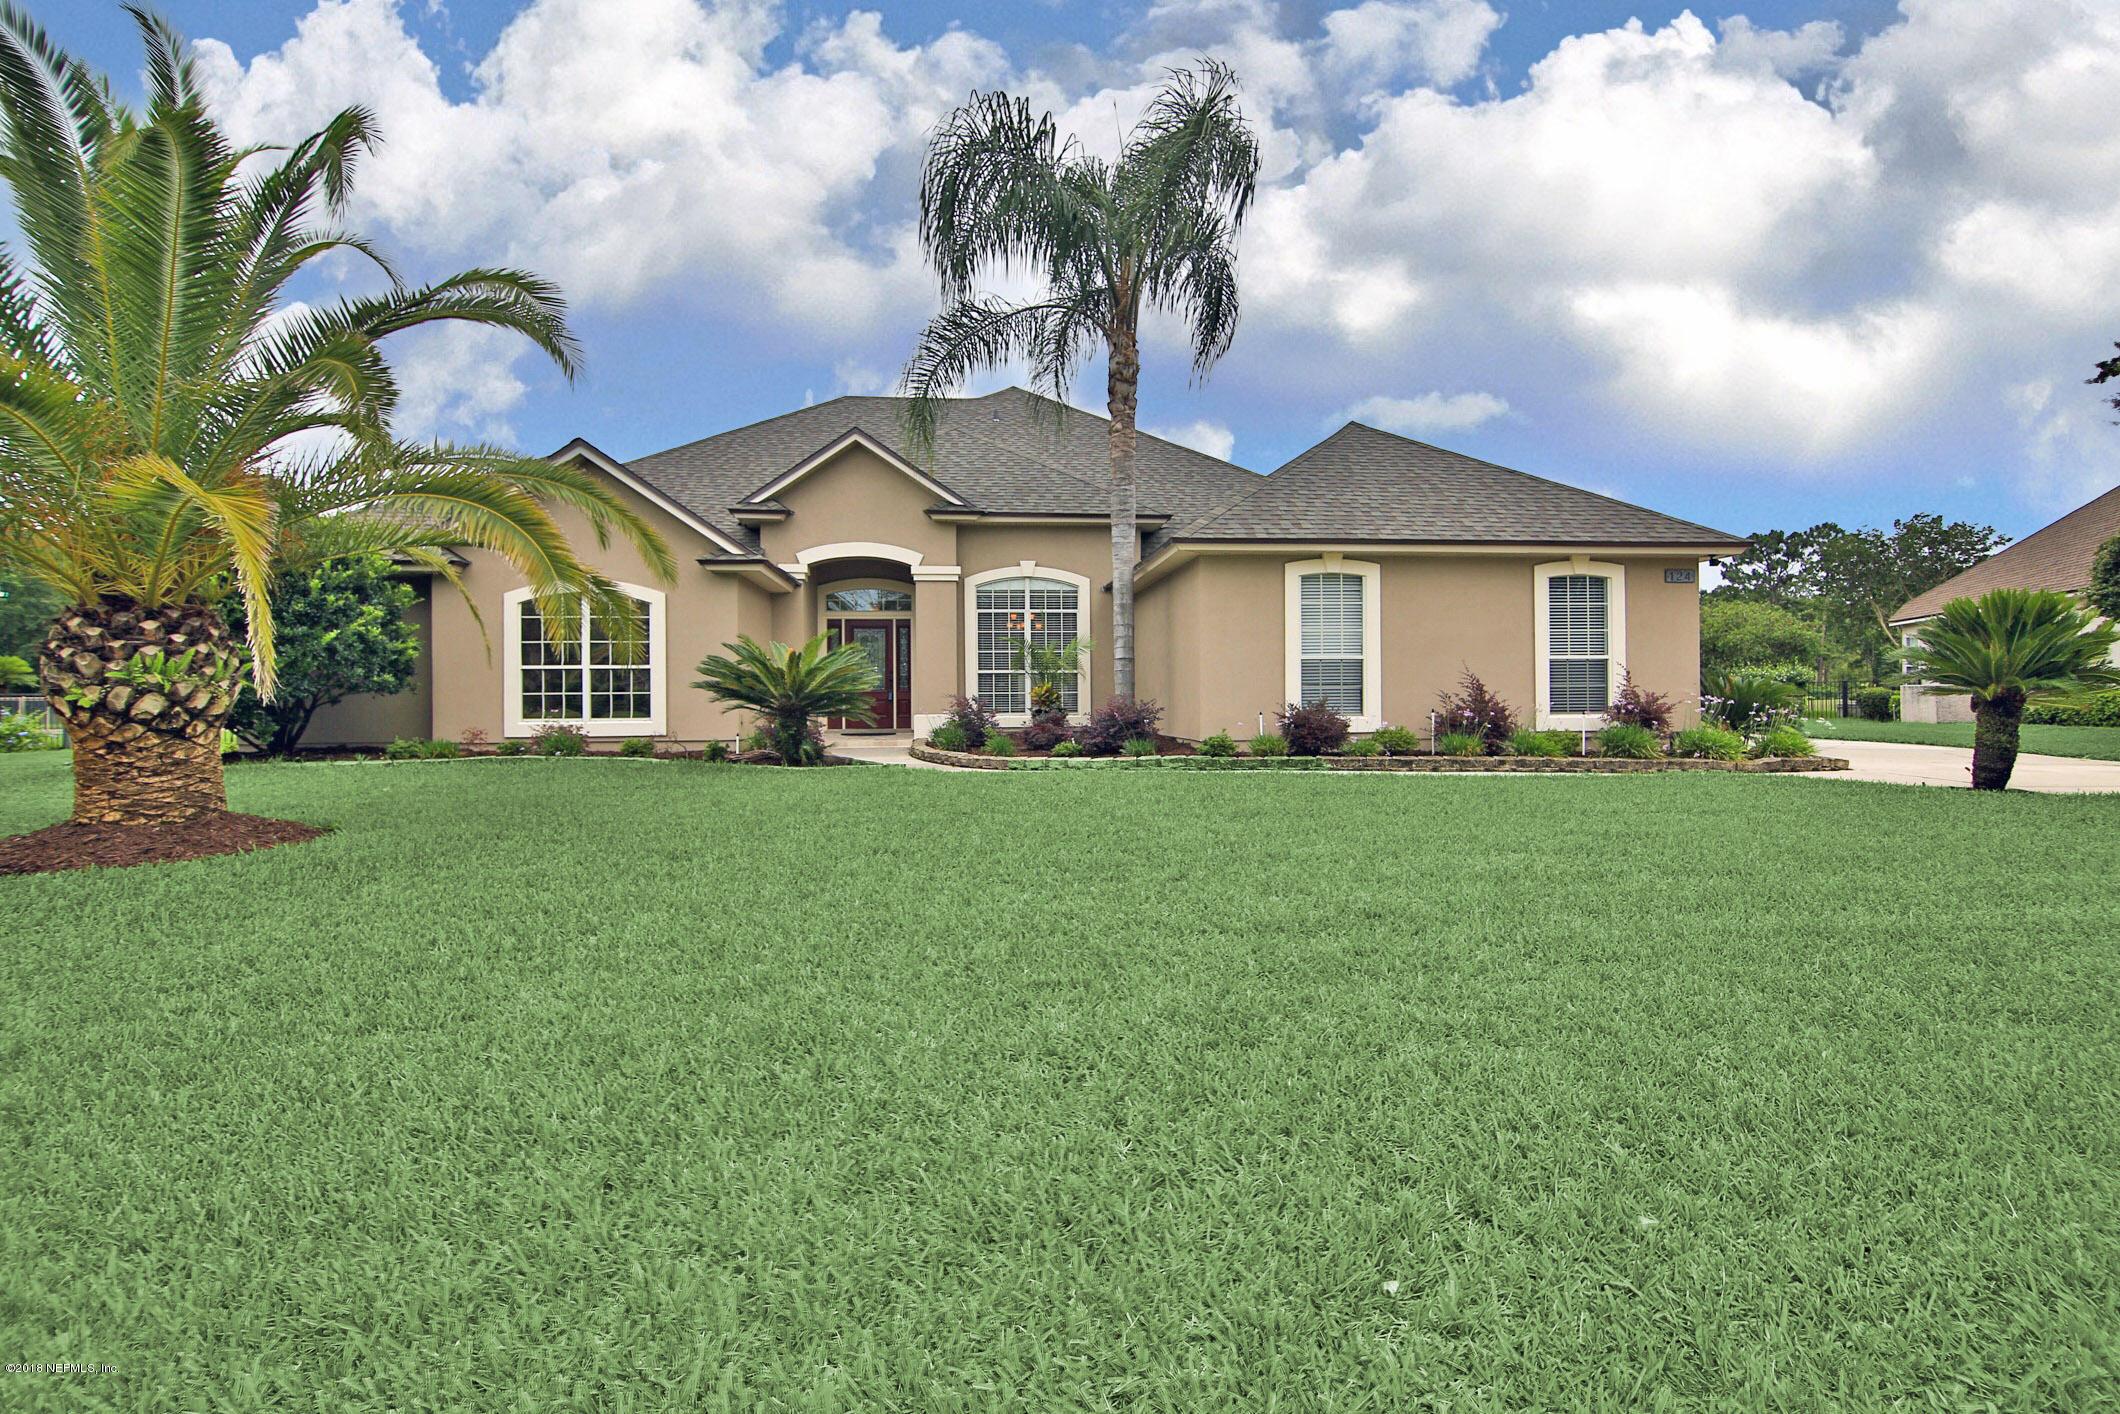 124  CATTAIL CIR, Saint Johns in ST. JOHNS County, FL 32259 Home for Sale